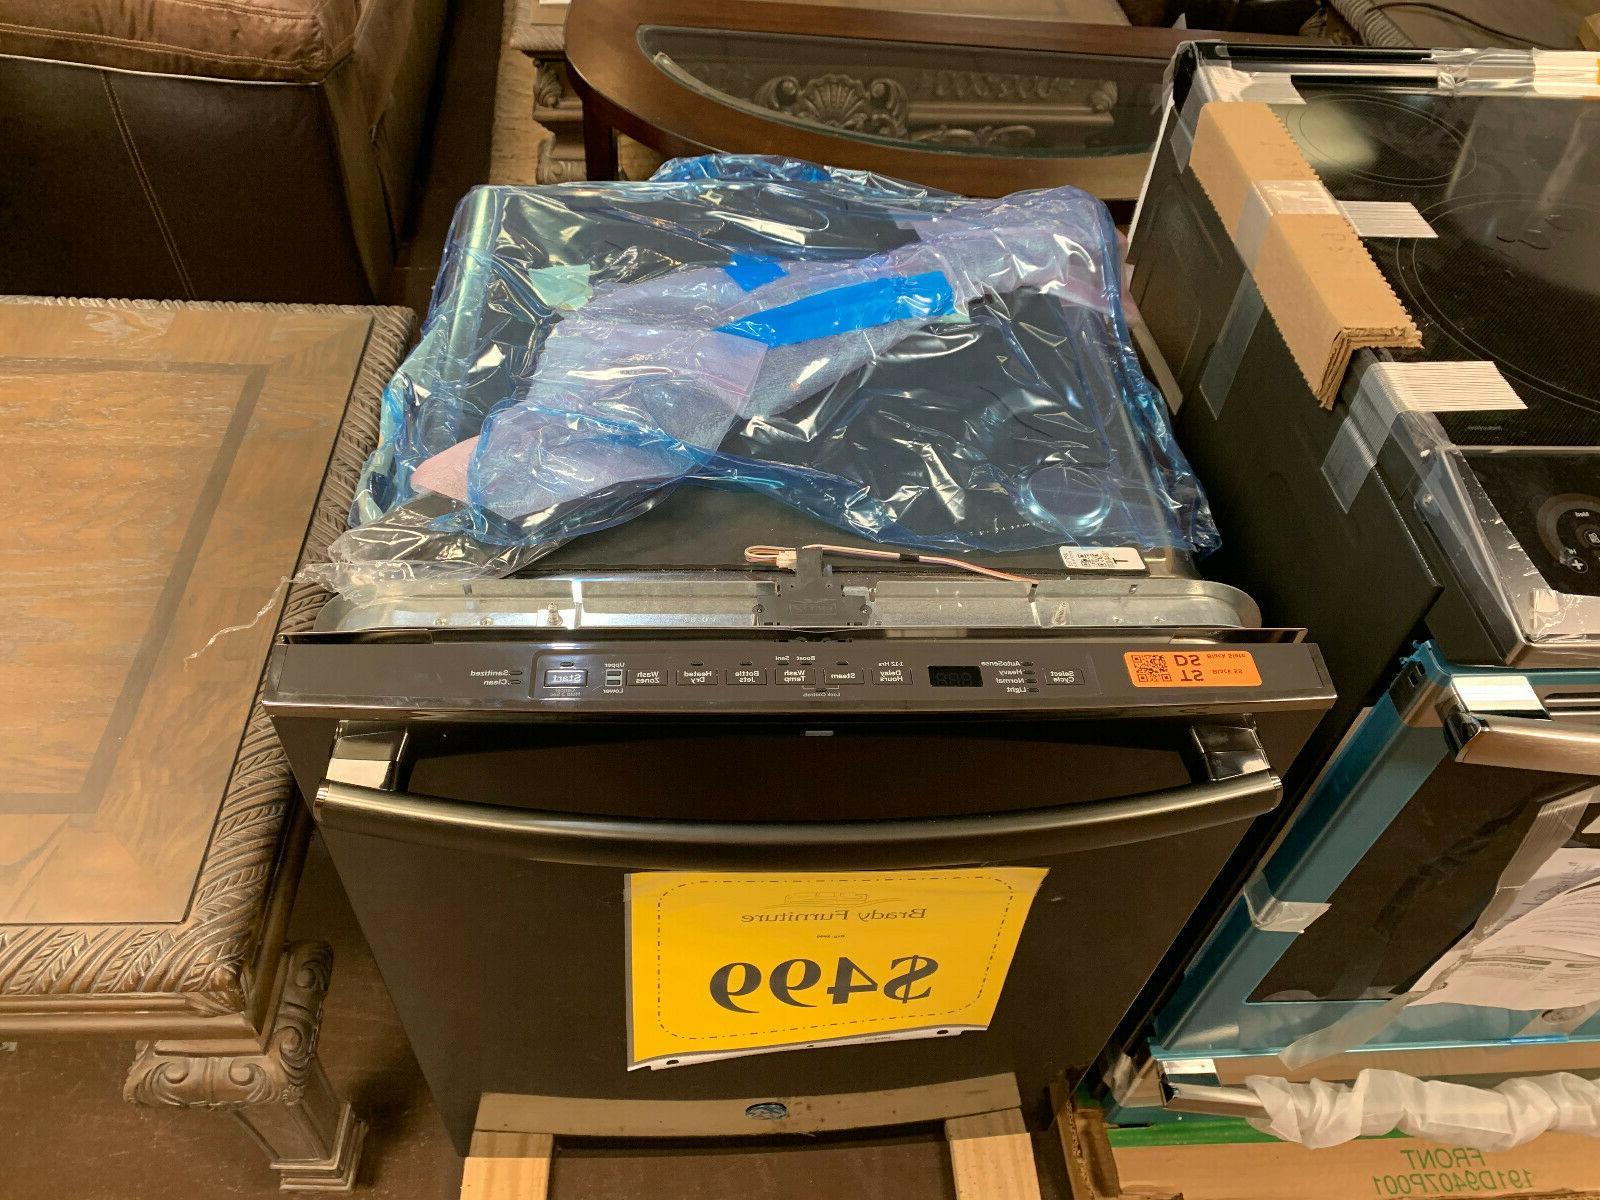 GE Black Stainless Integrated Dishwasher